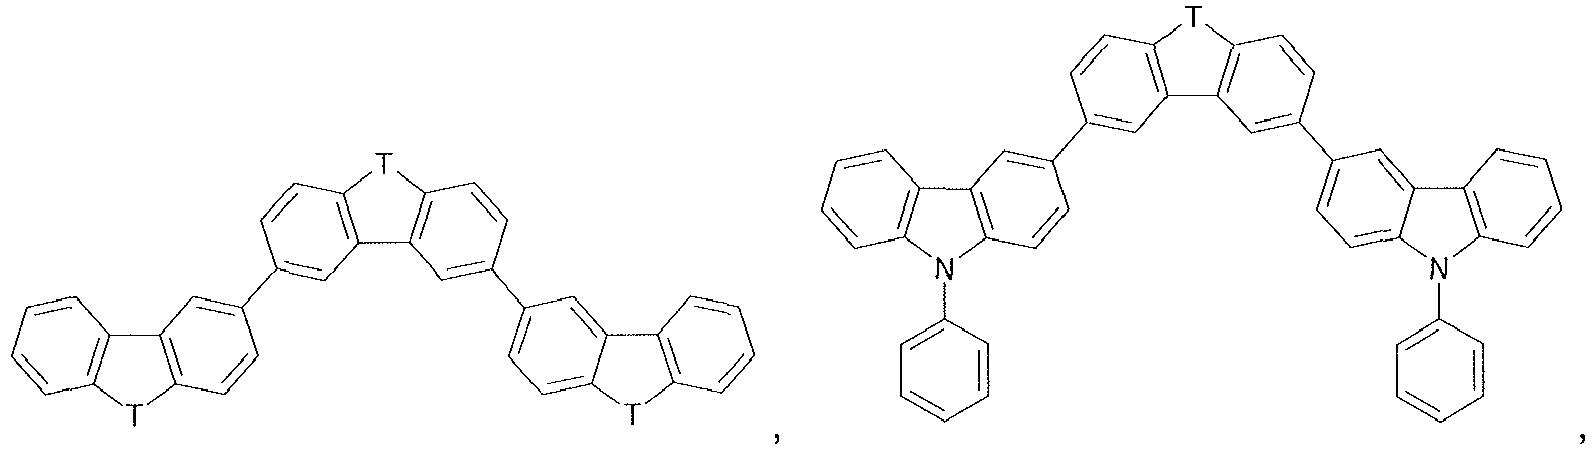 Figure imgb0693